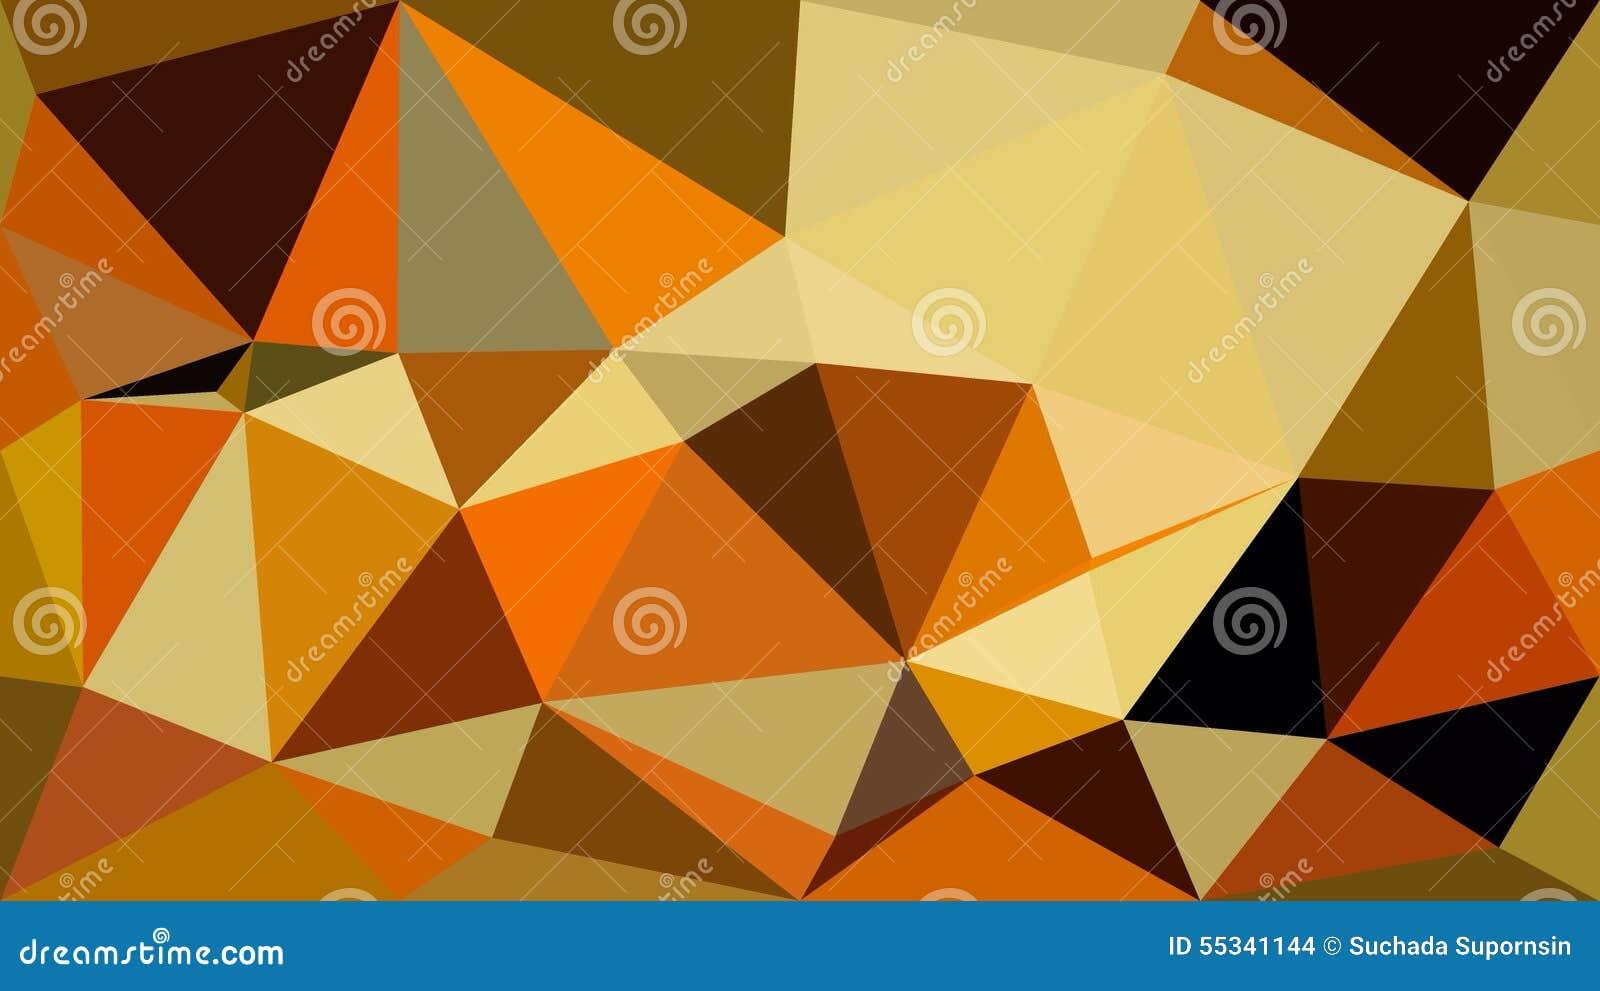 Triangle Orange White Black Polygon Wallpaper Stock Illustration